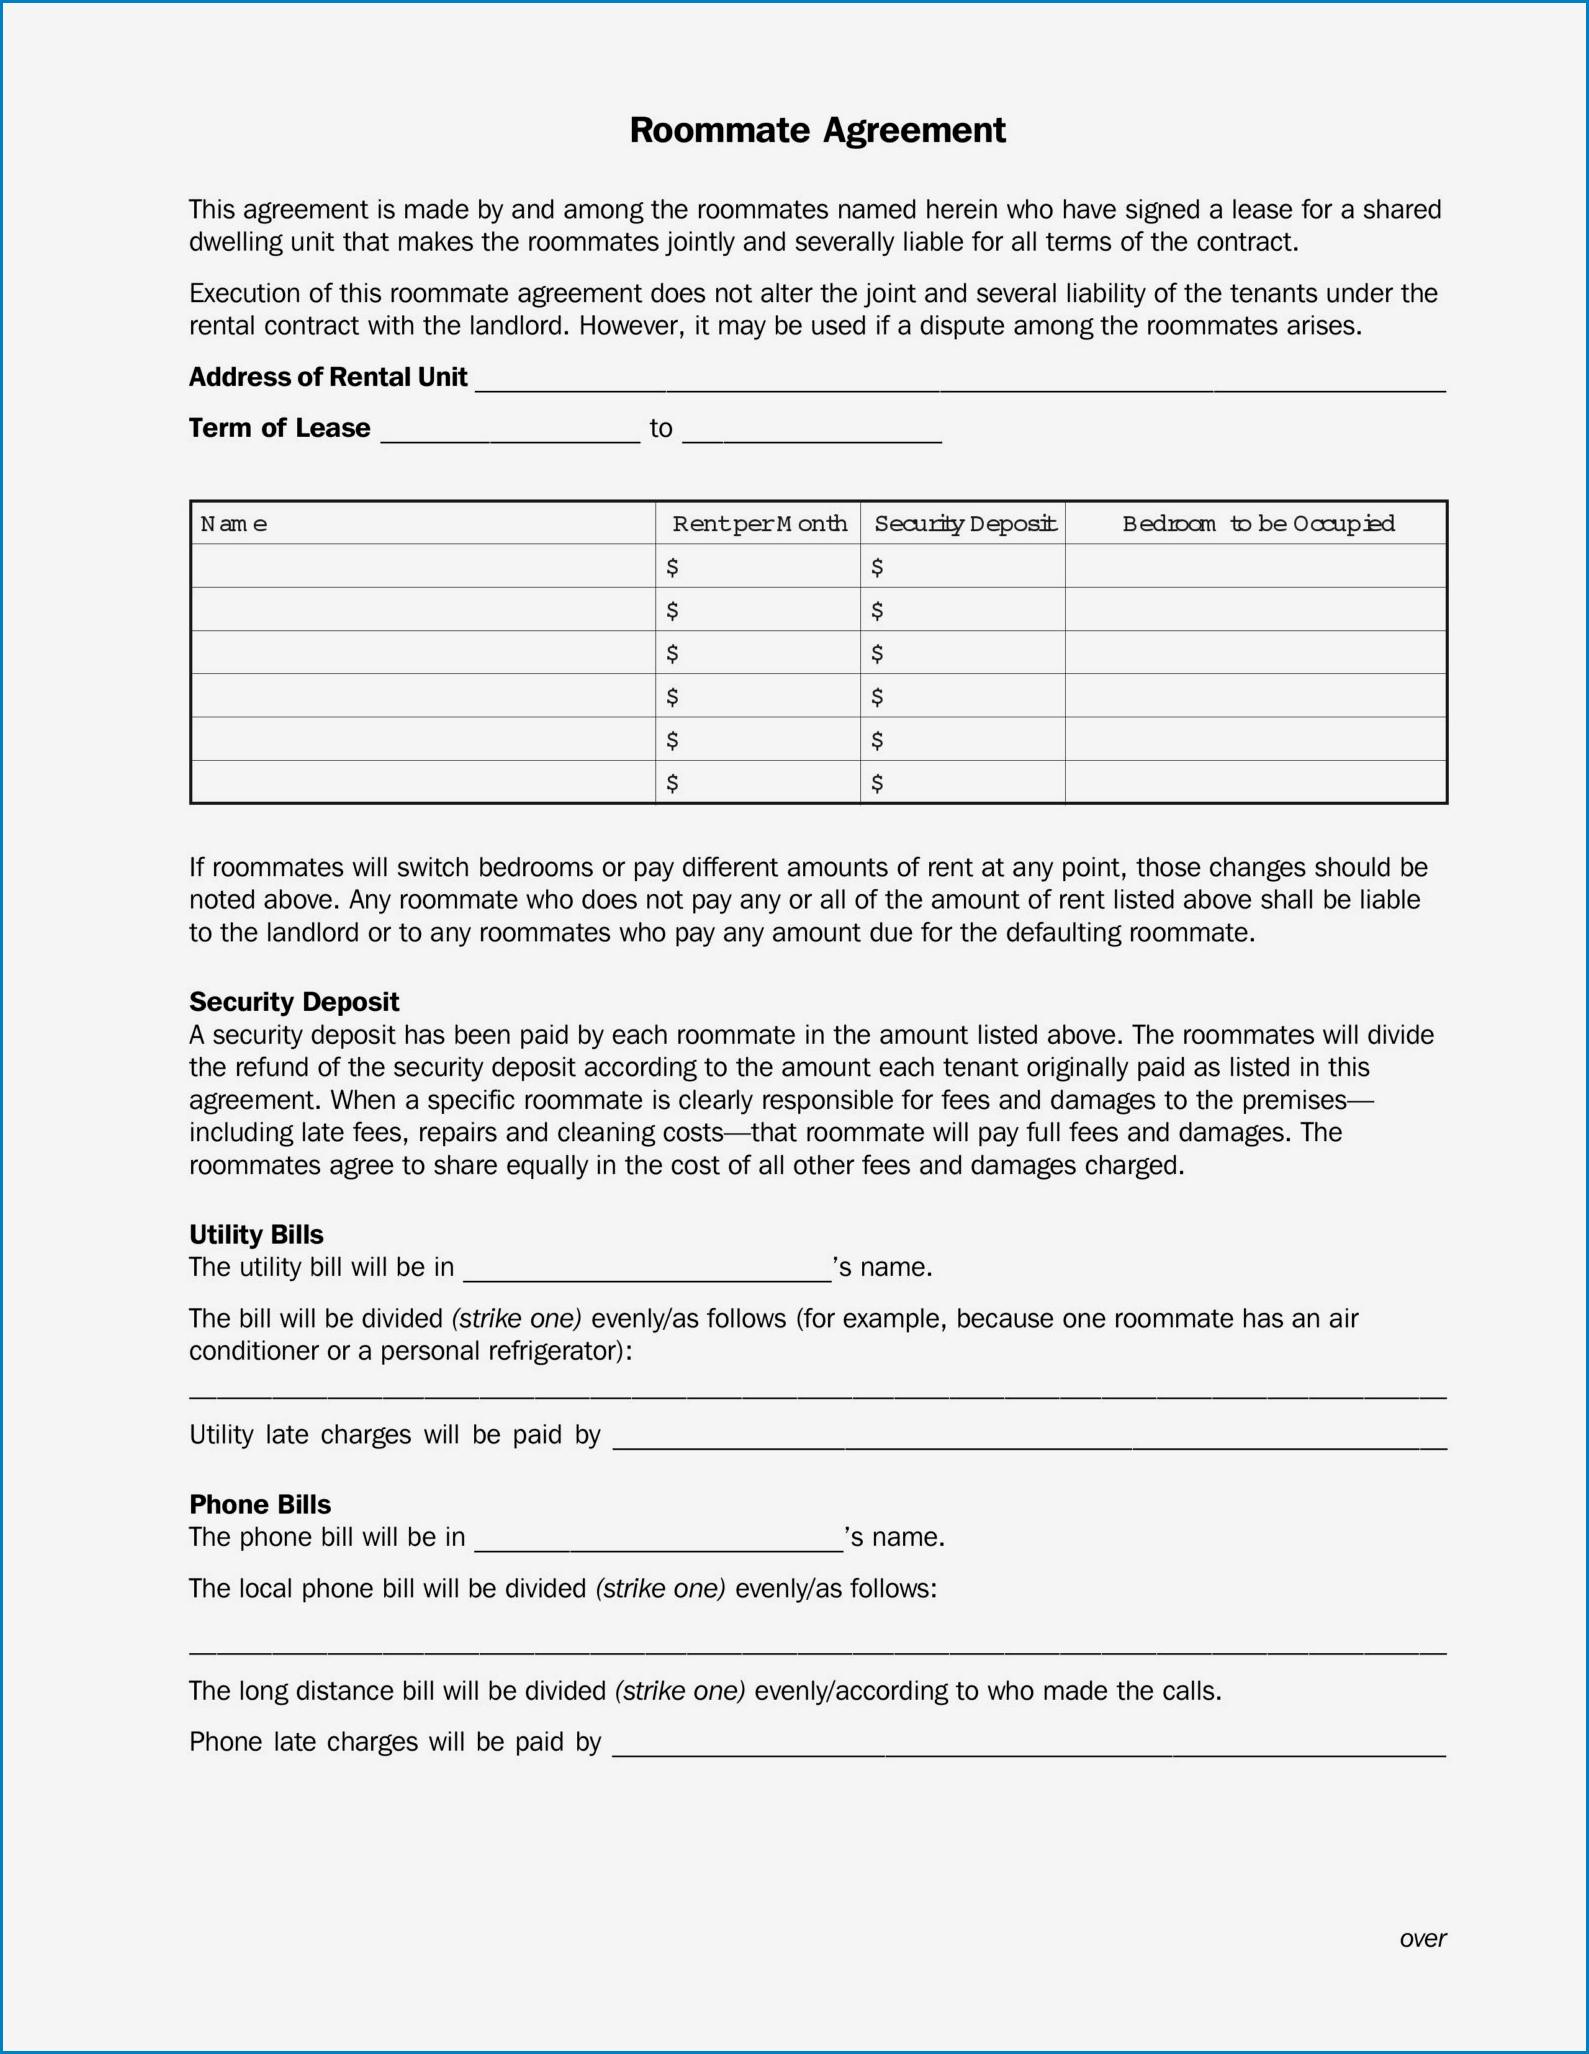 Roommate Agreement Template Sample